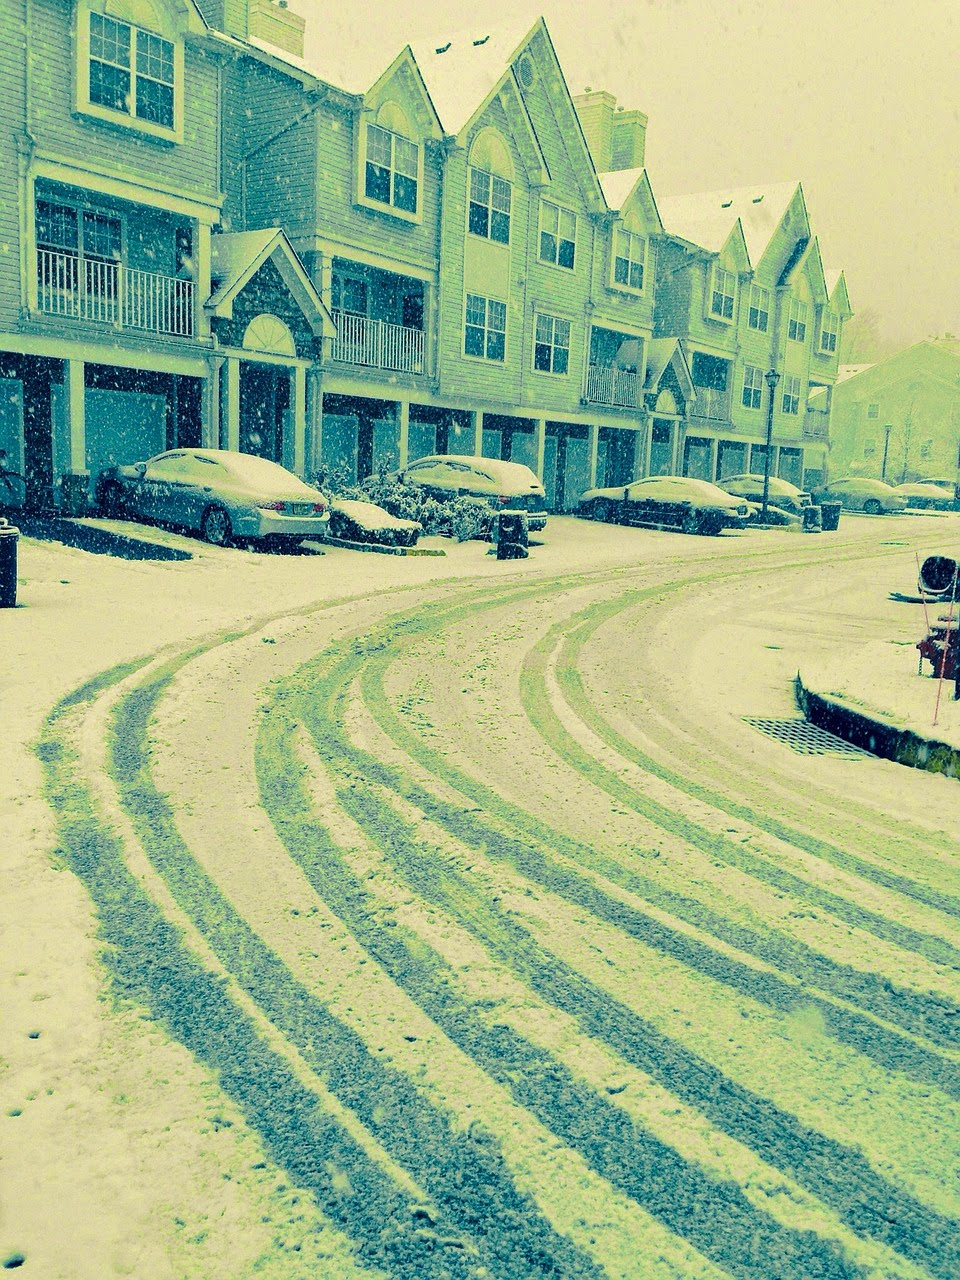 image Kawartha Lakes Snow Plowing Challenge image showing snowy suburban street